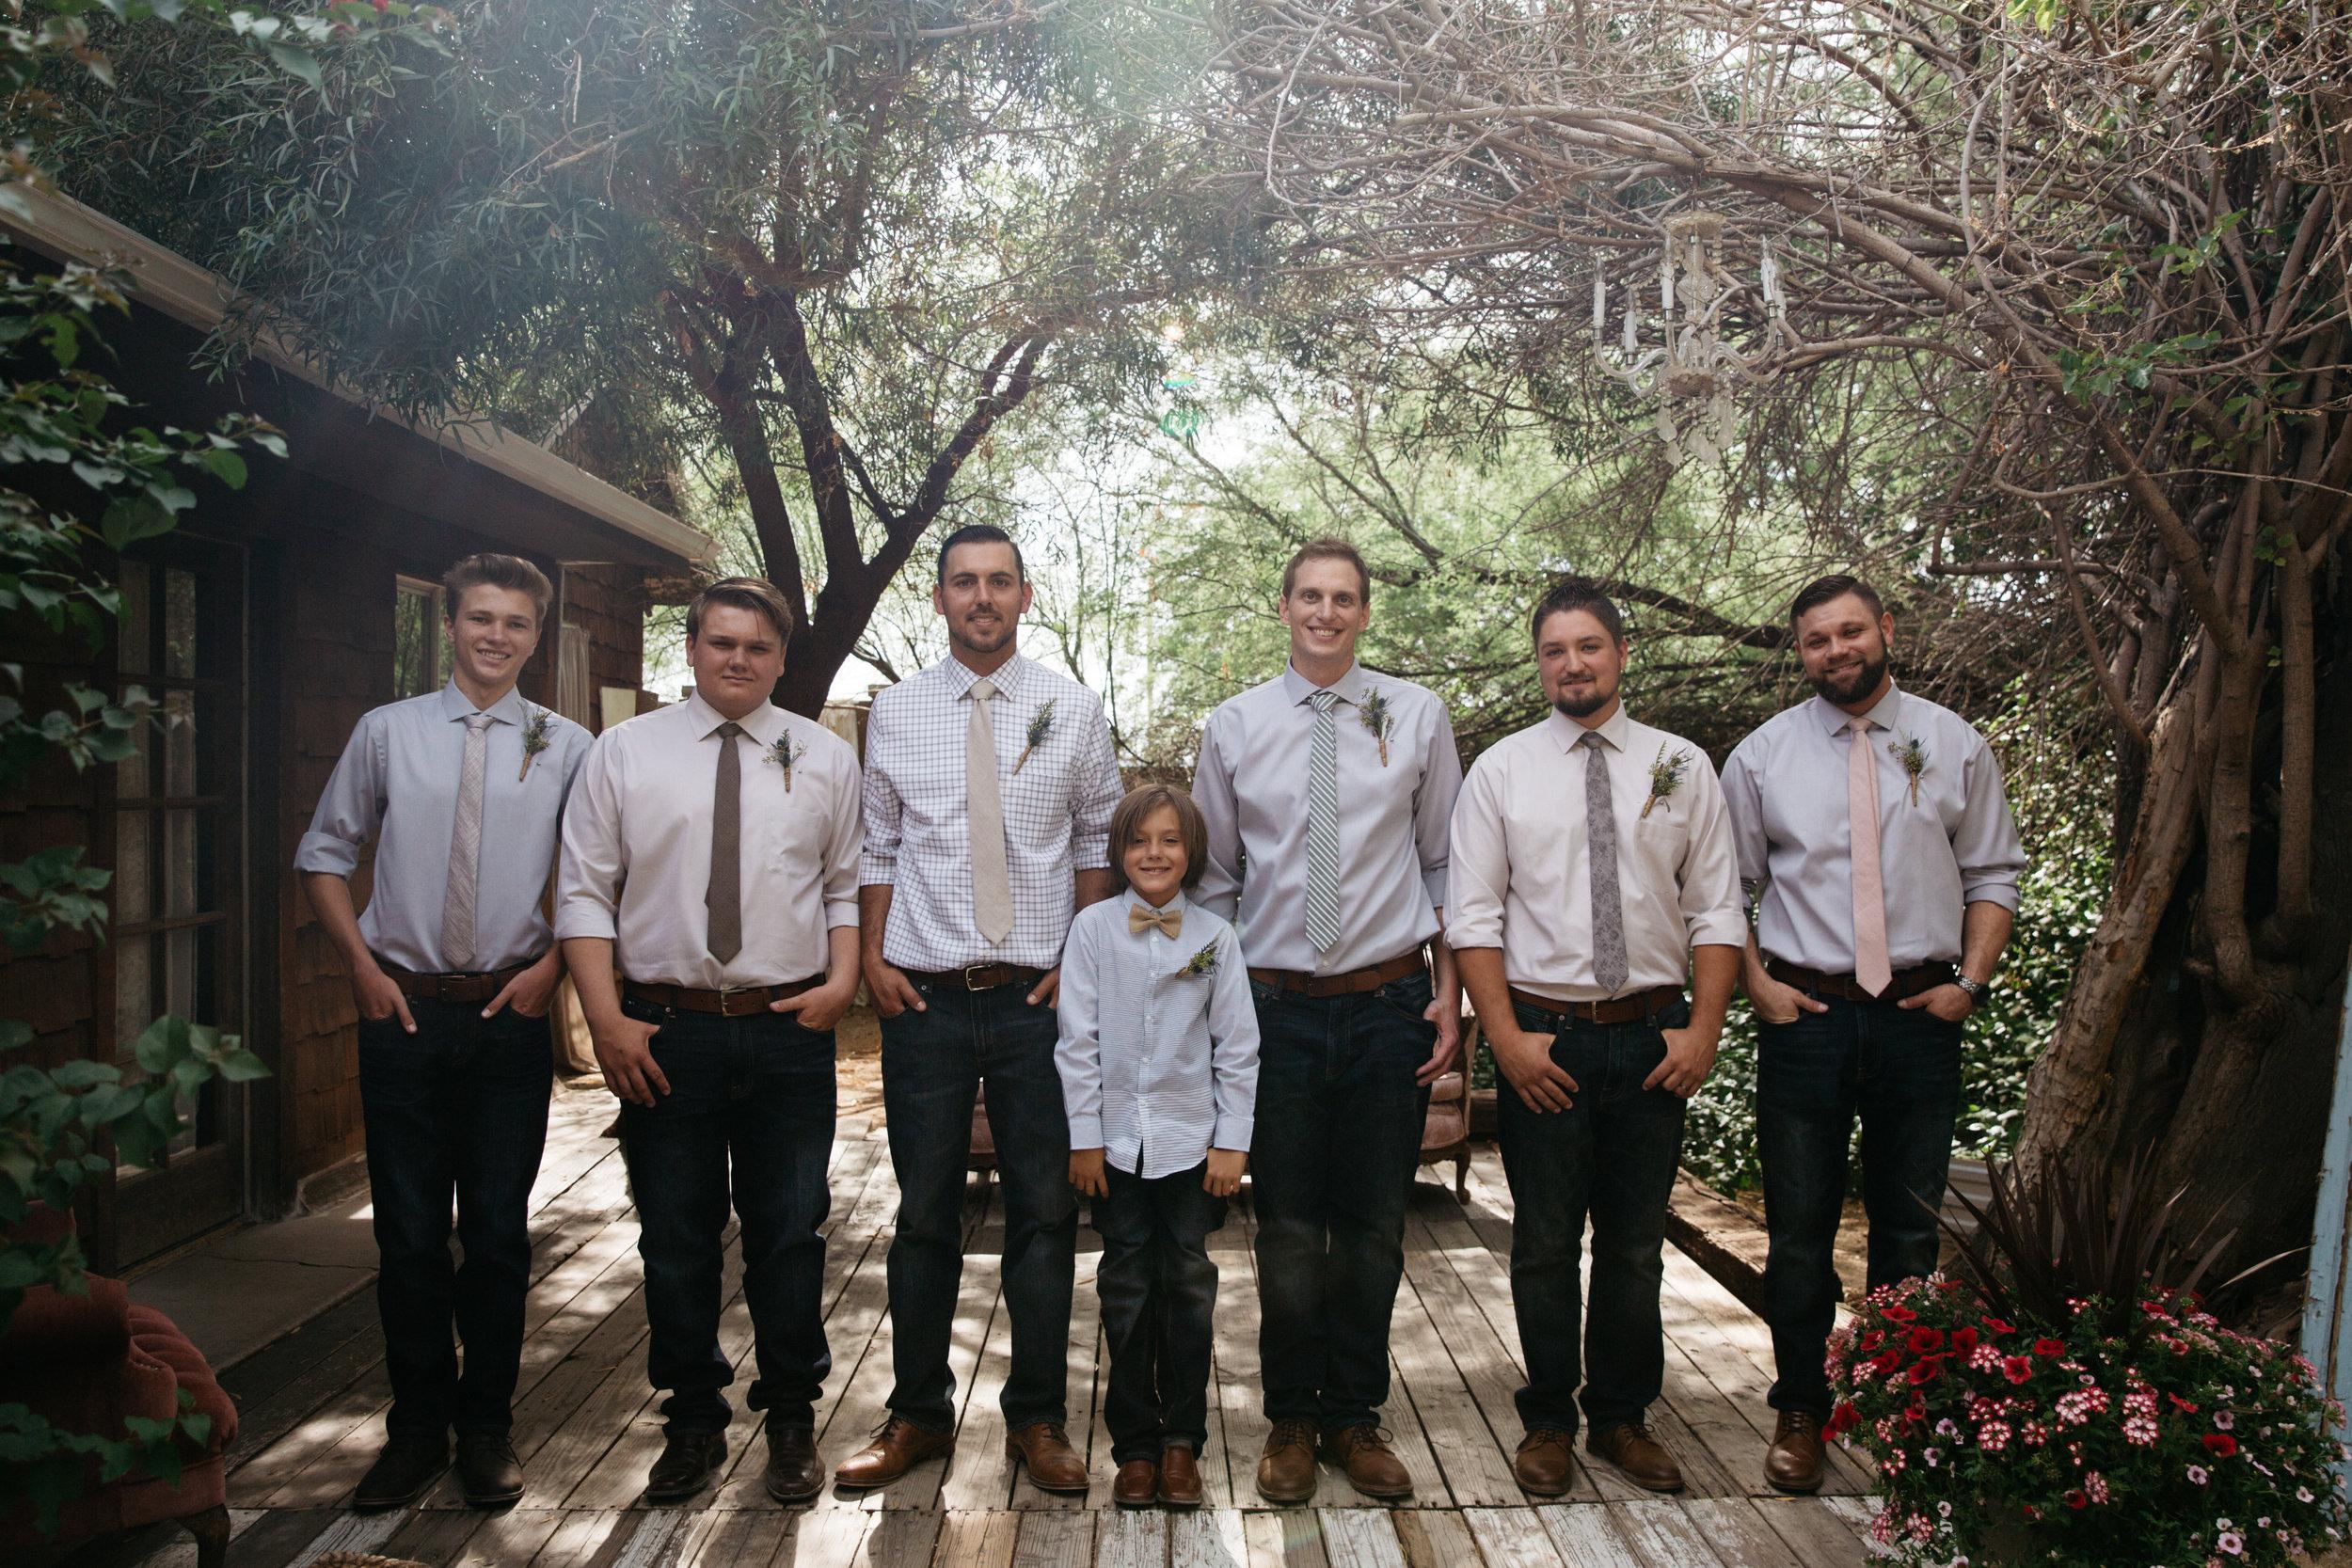 colorado-springs-wedding-photographer-22.jpg